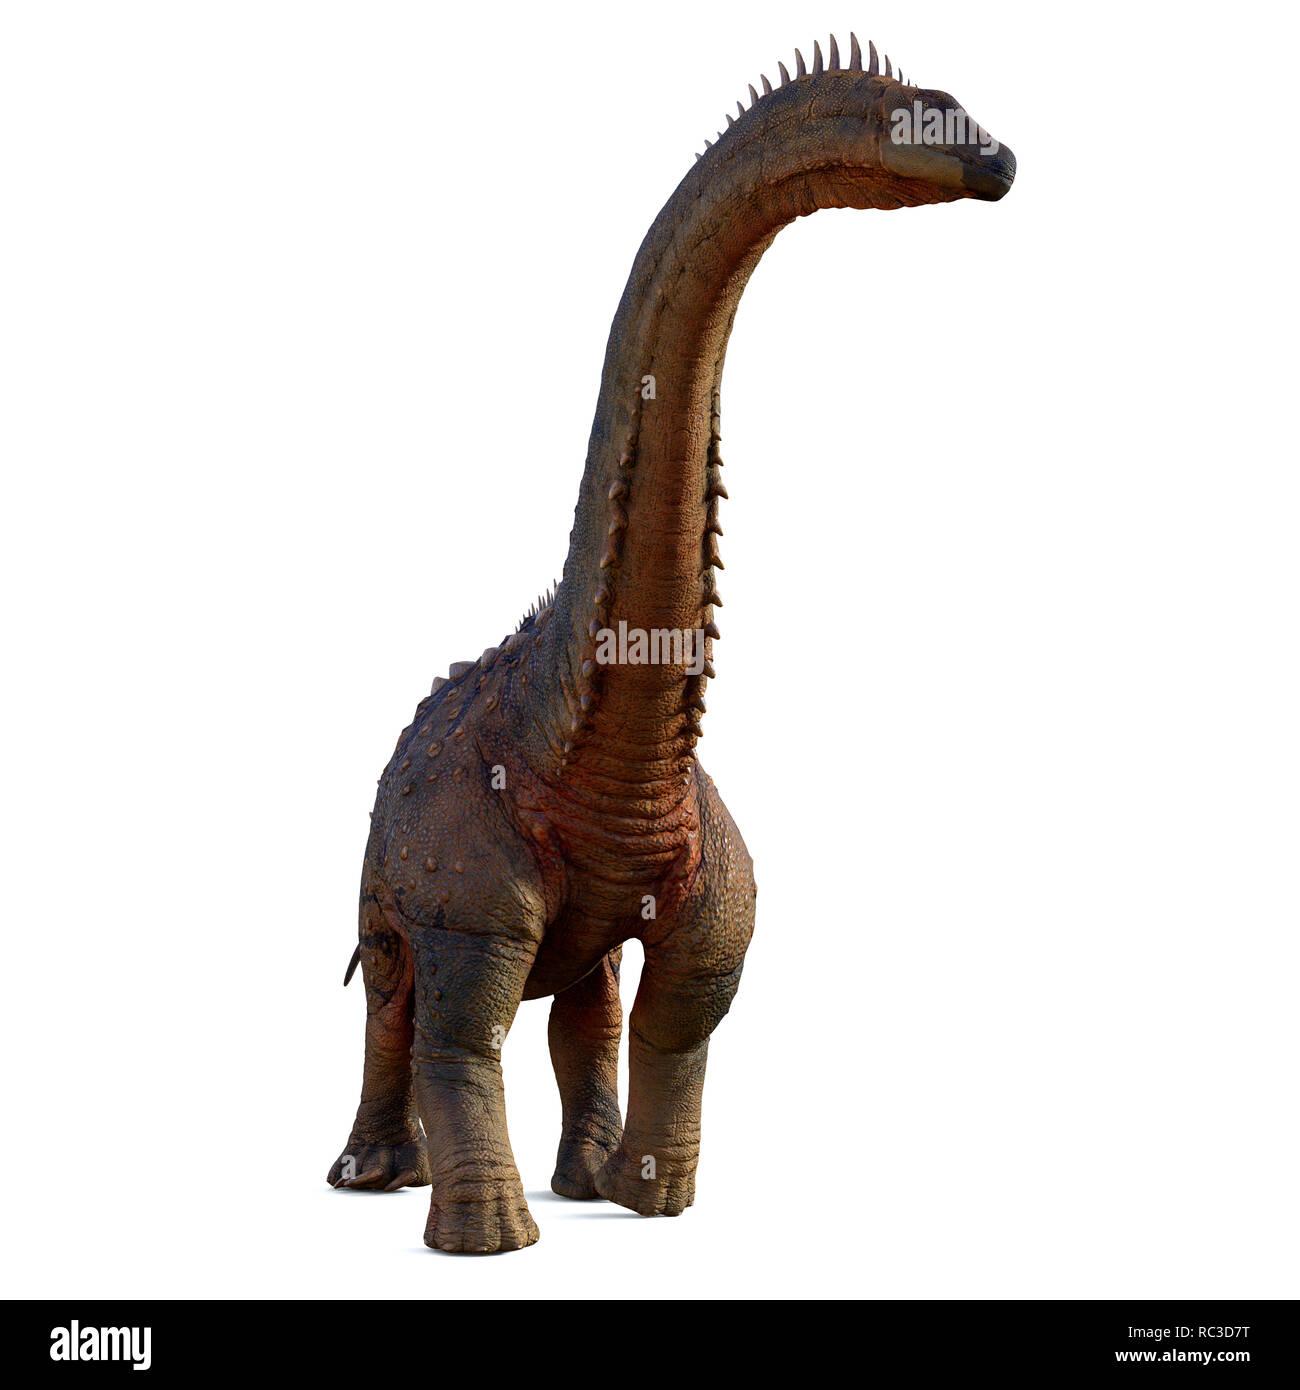 Alamosaurus Dinosaur - Alamosaurus was a titanosaur sauropod herbivorous dinosaur that lived in North America during the Cretaceous Period. - Stock Image